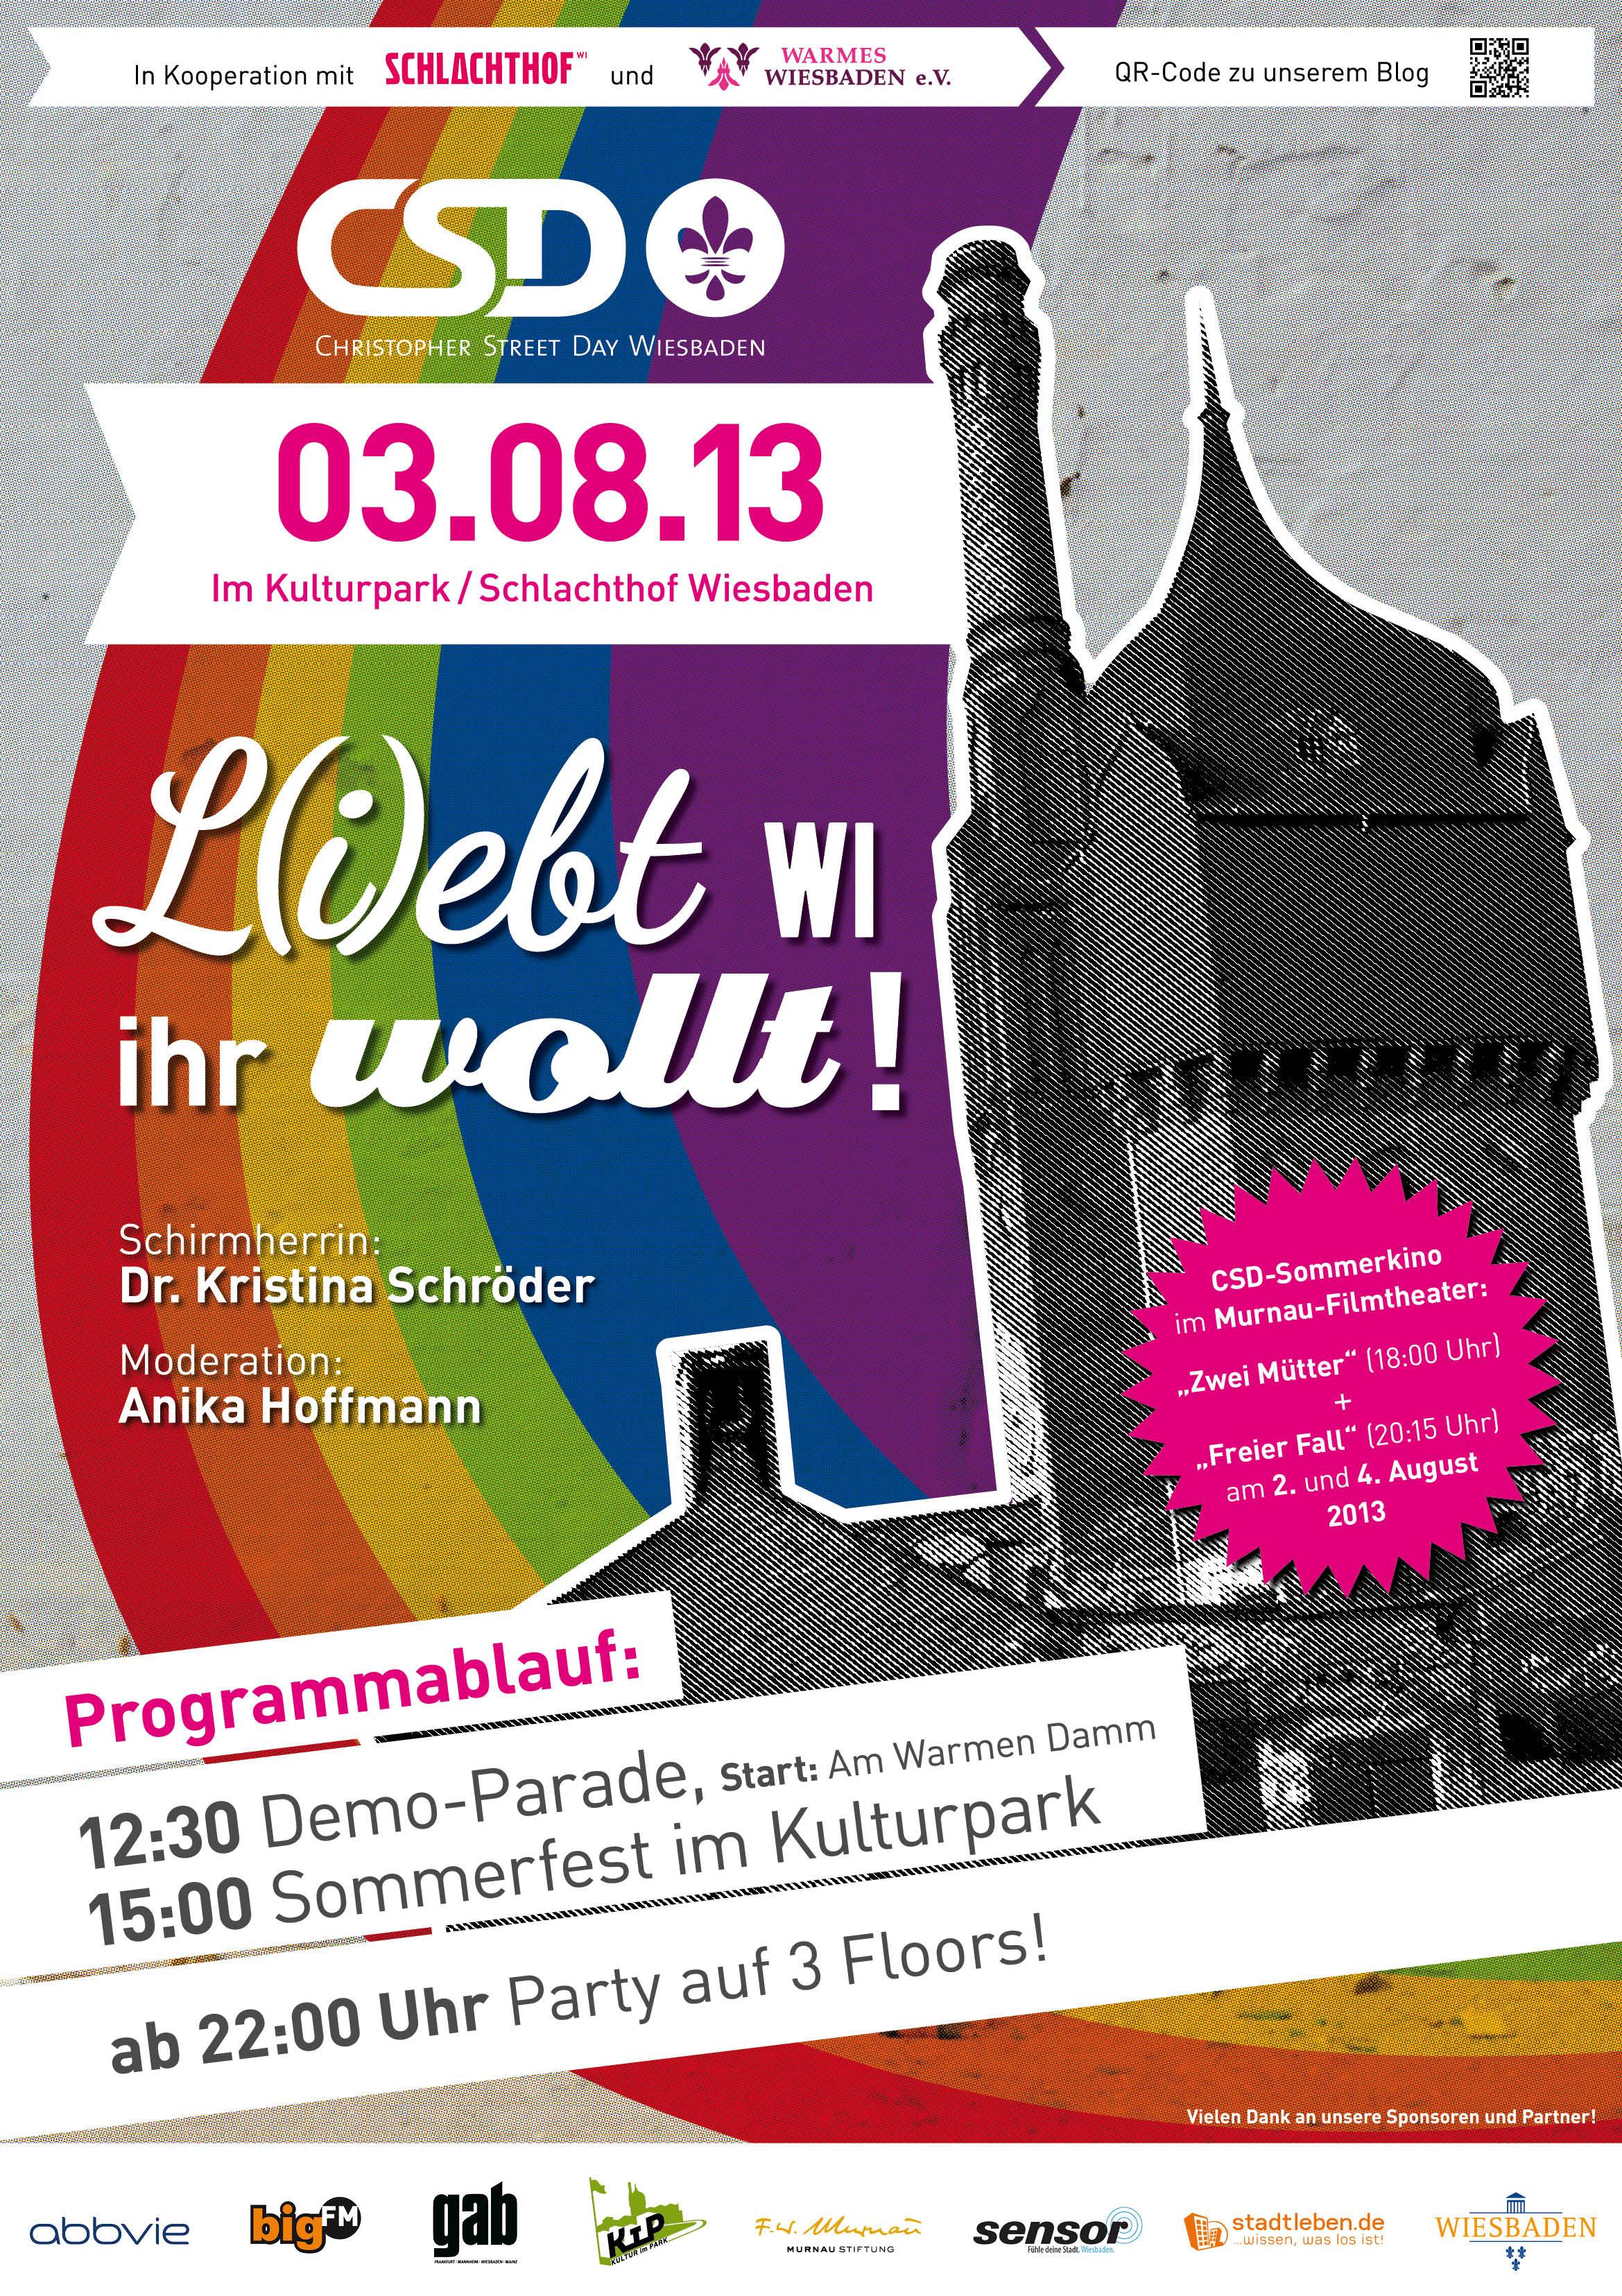 Countdown CSD Wiesbaden 2013